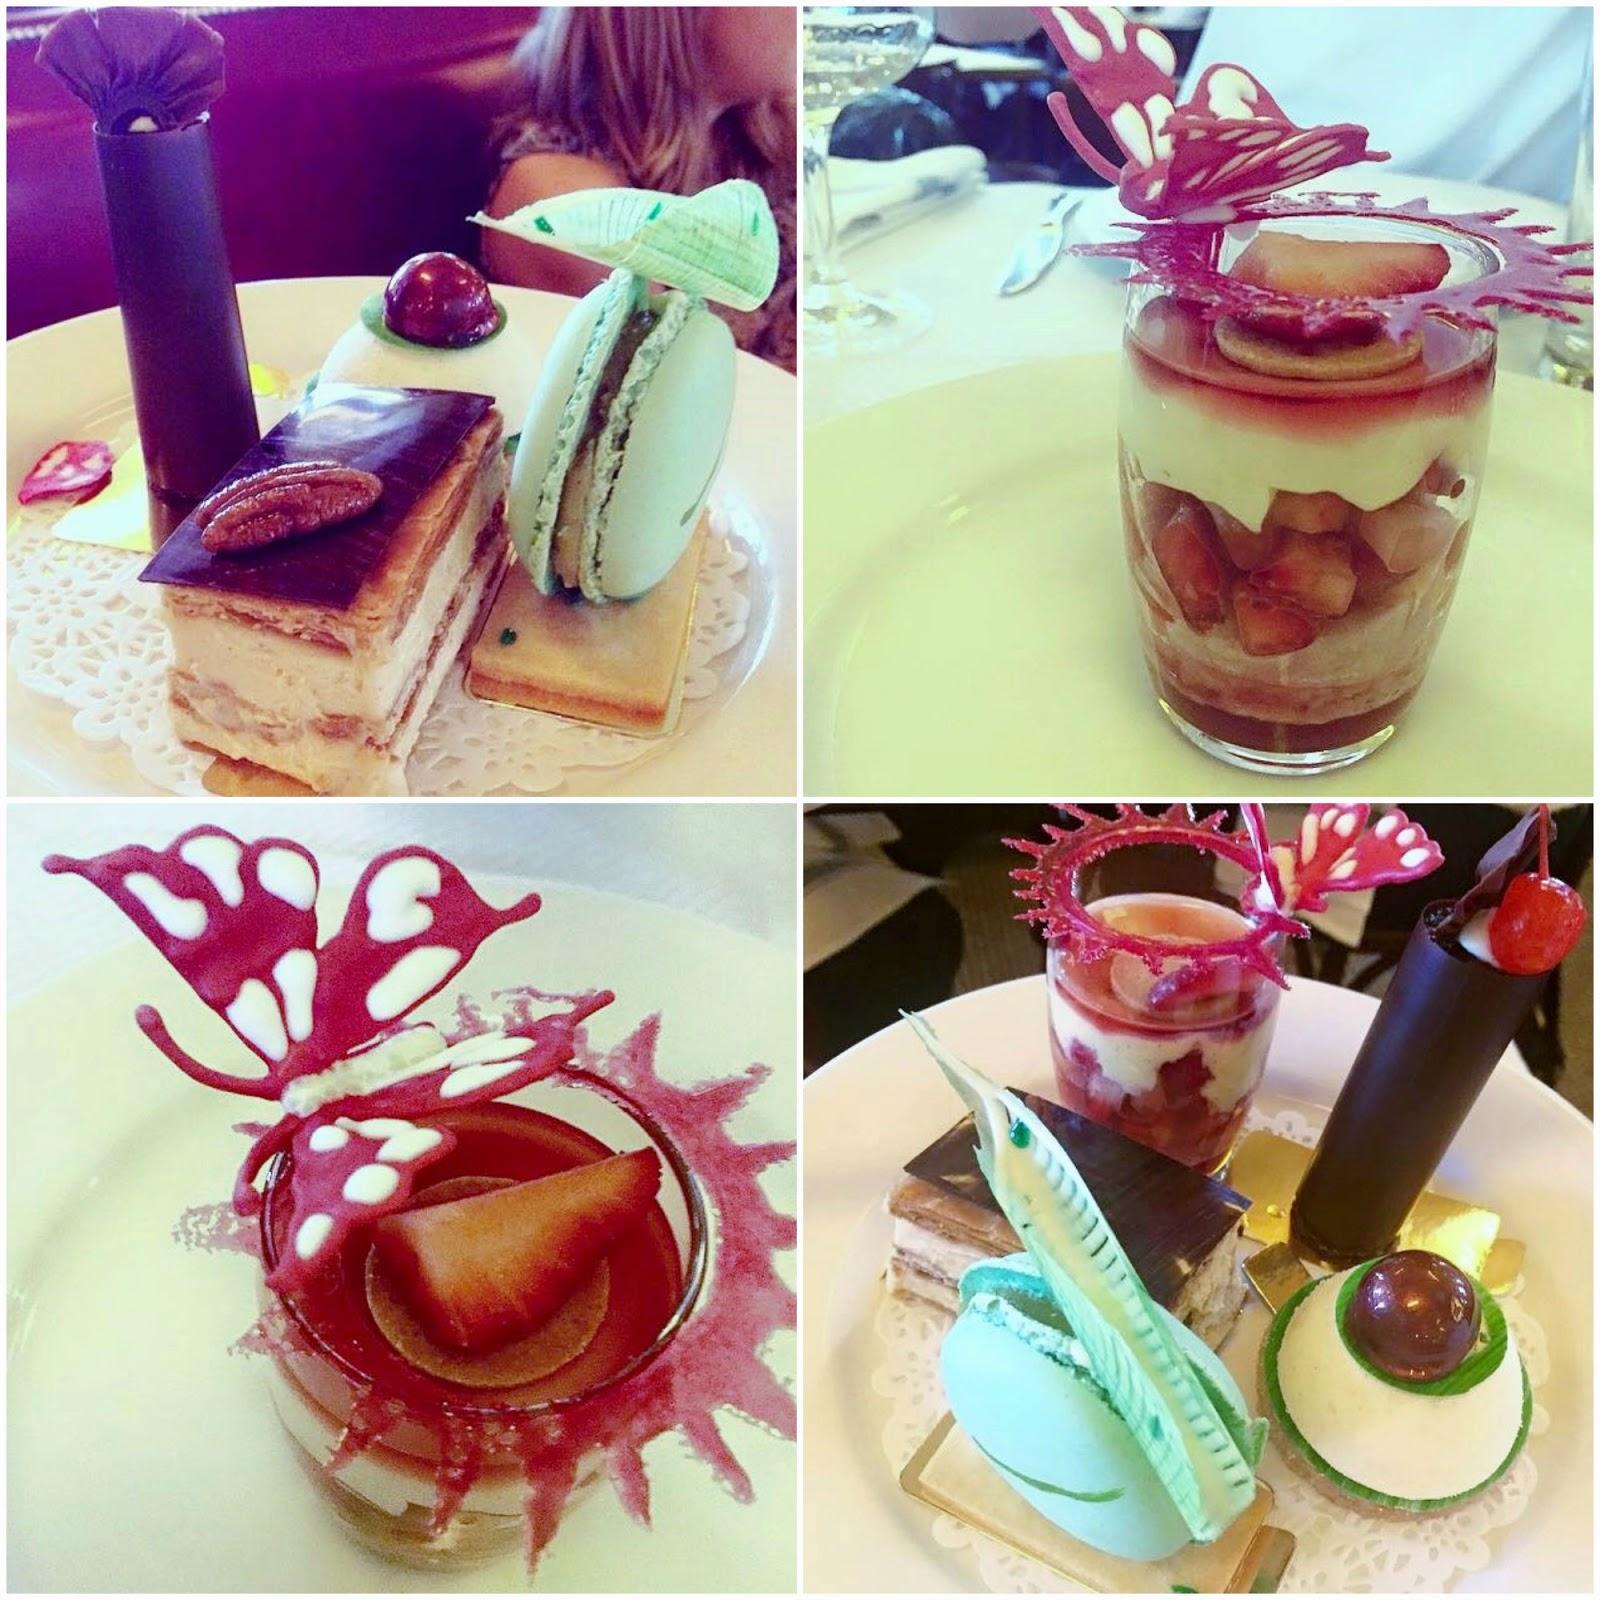 Balthazar Covent Garden, London, Mathew Williamson Afternoon Tea, dessert, pudding, foodie, food porn, cake, pastries,